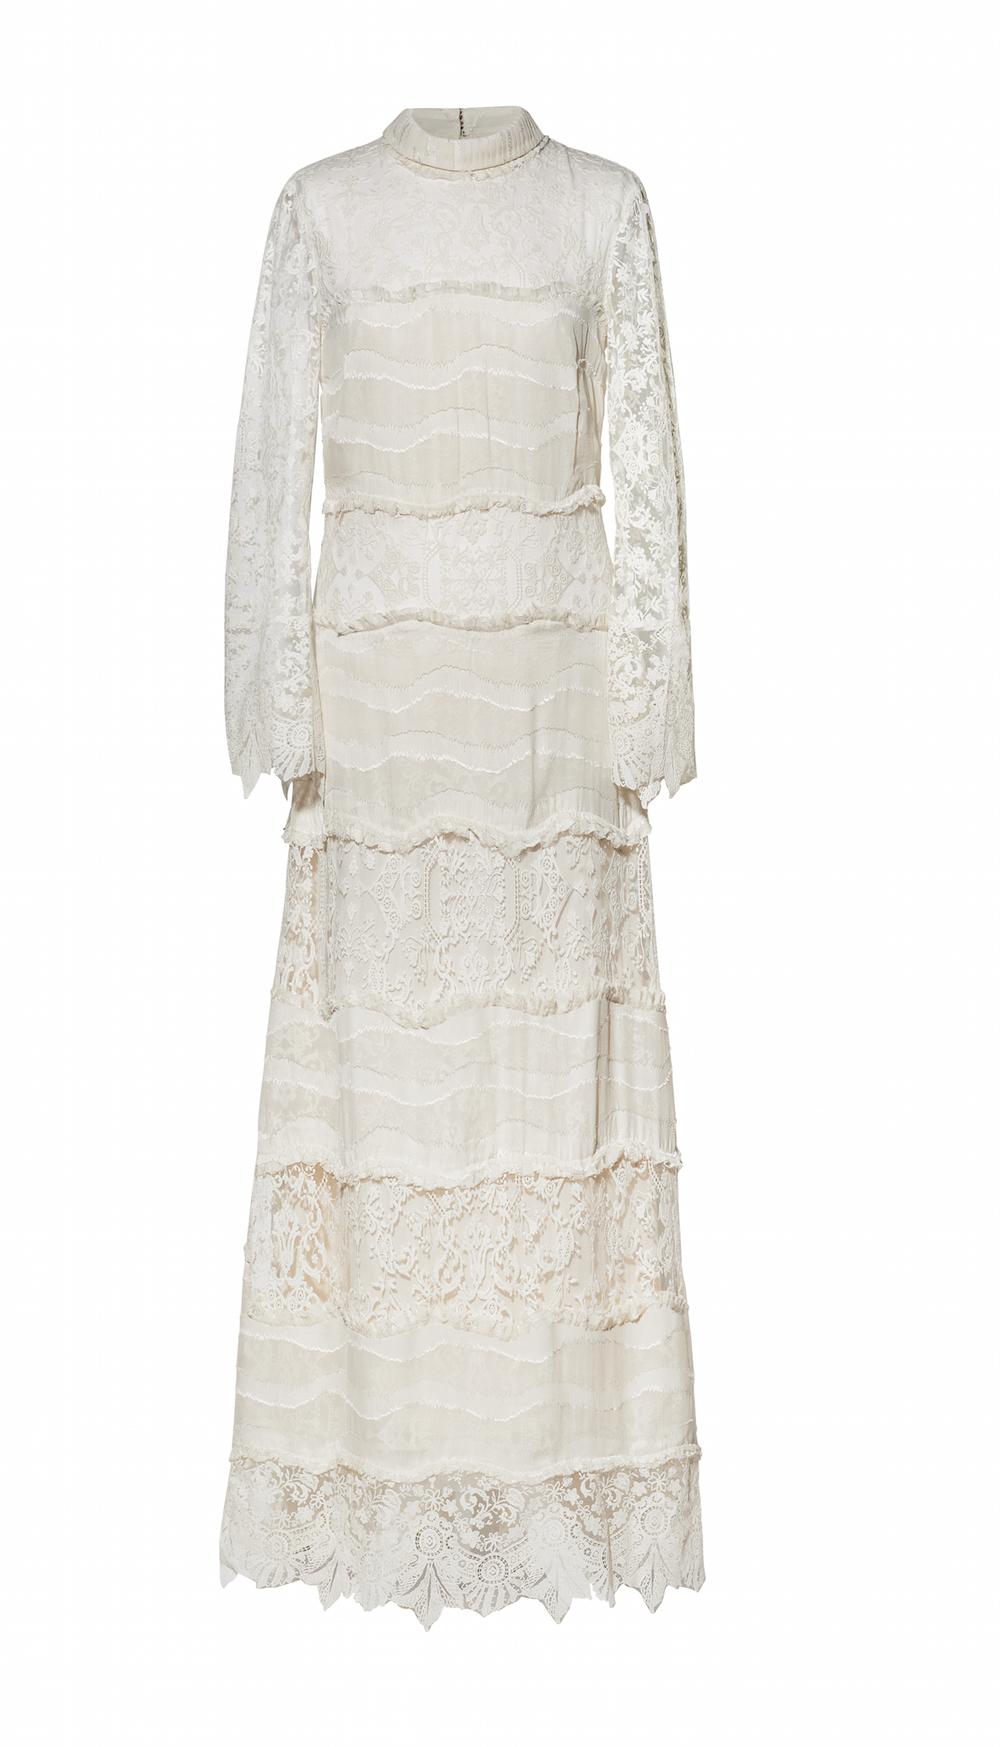 hm-wedding-gown-2.jpg